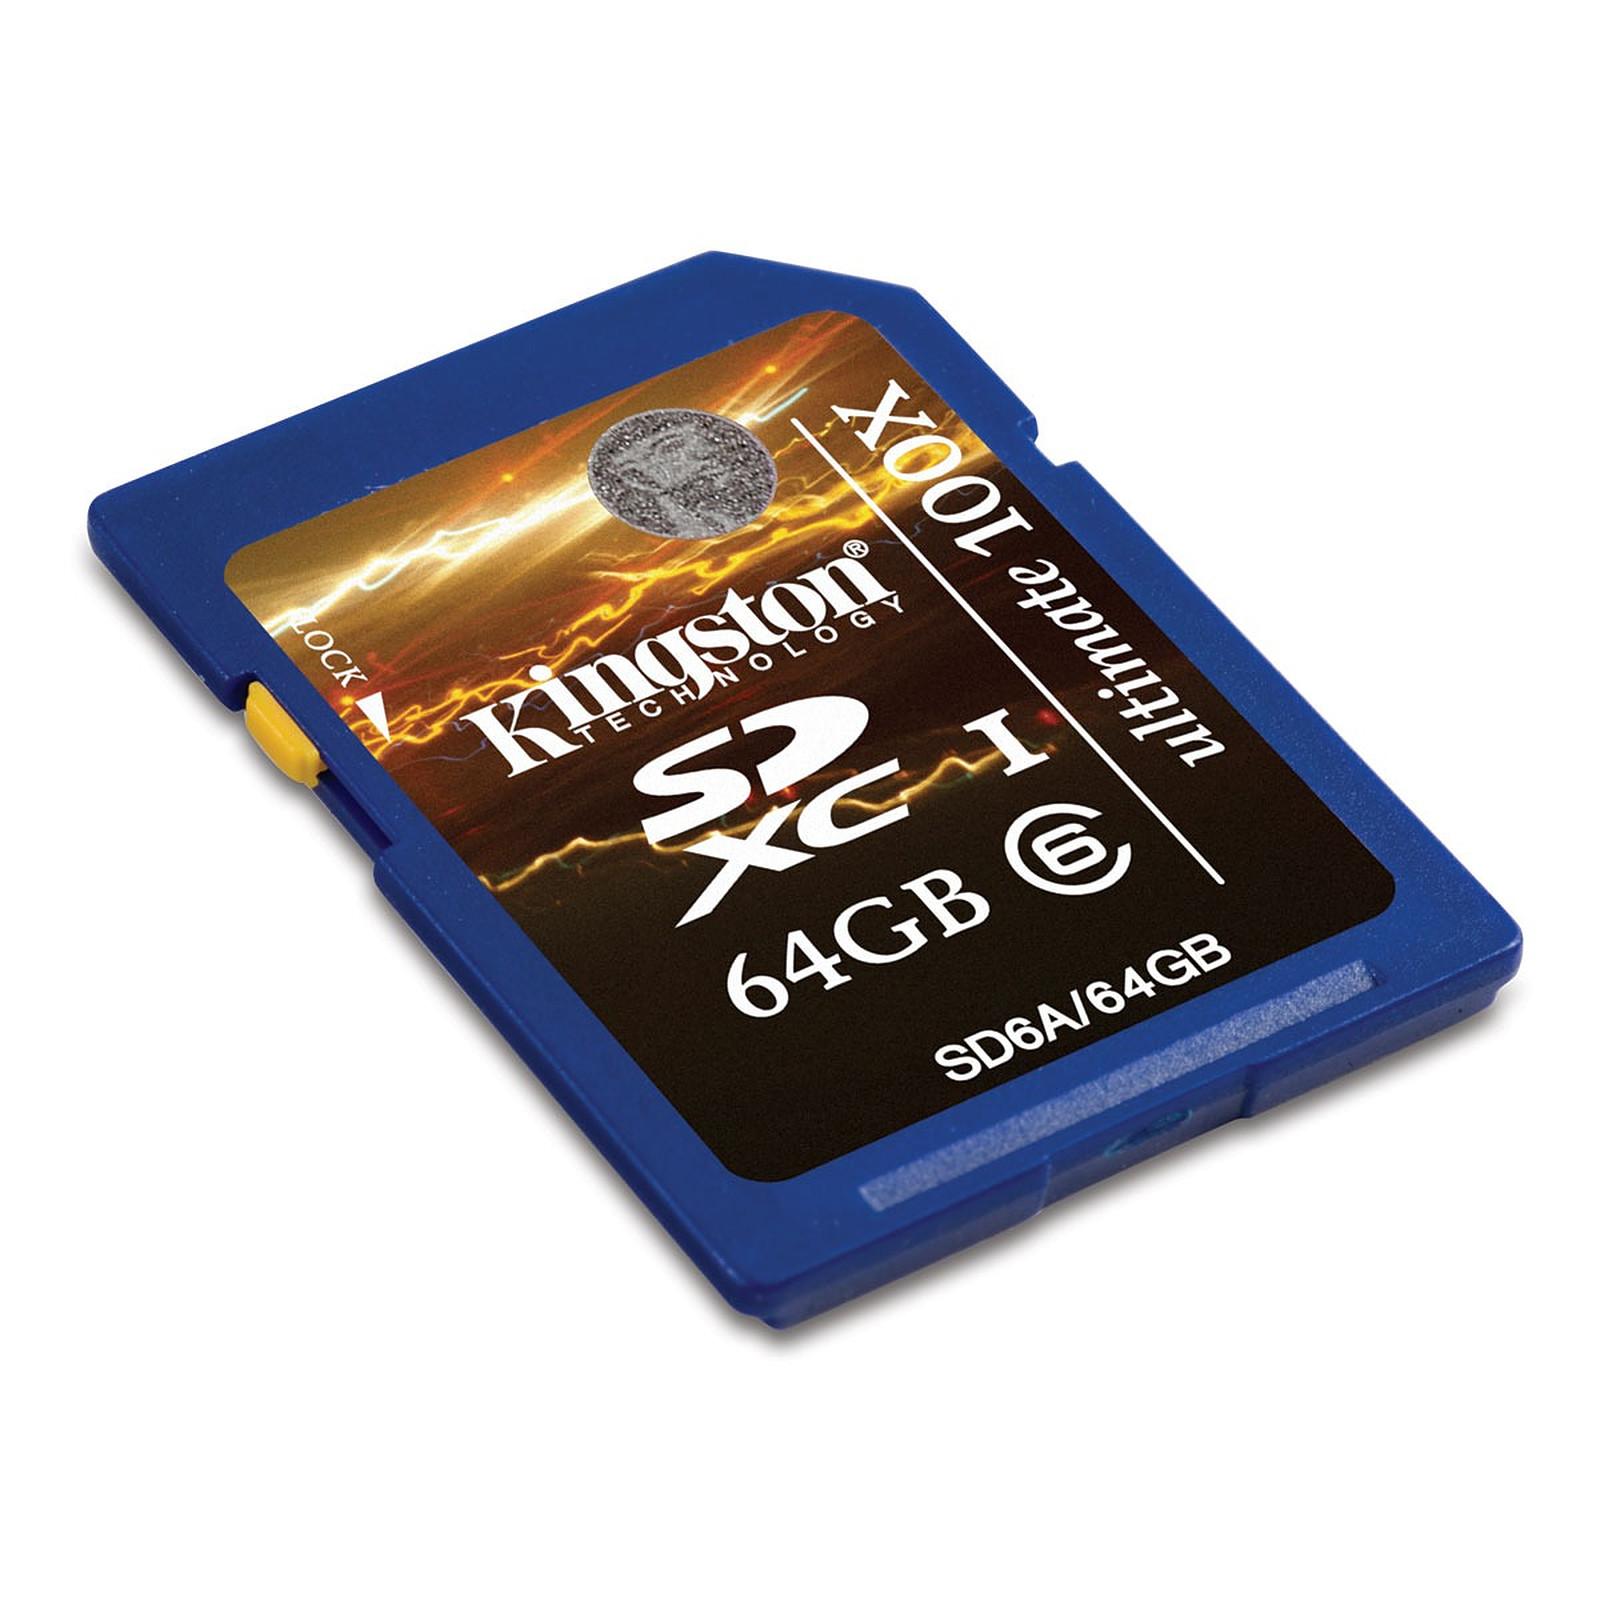 Kingston SDXC Class 6 Ultimate 64 GB